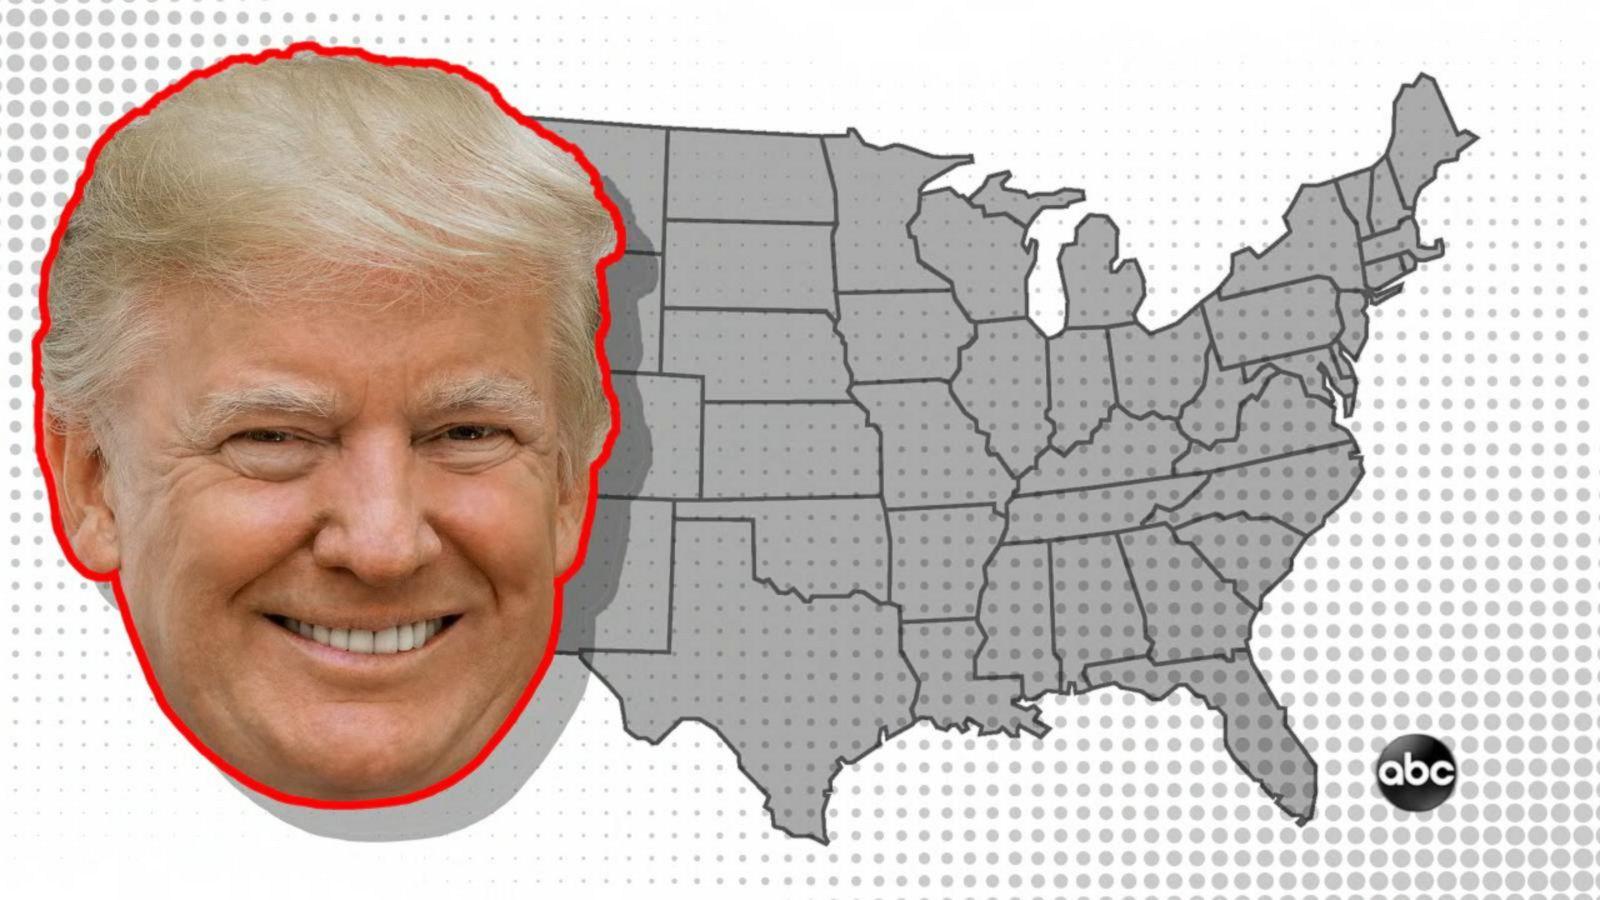 'Trump's getting into underdog territory': Nate Silver